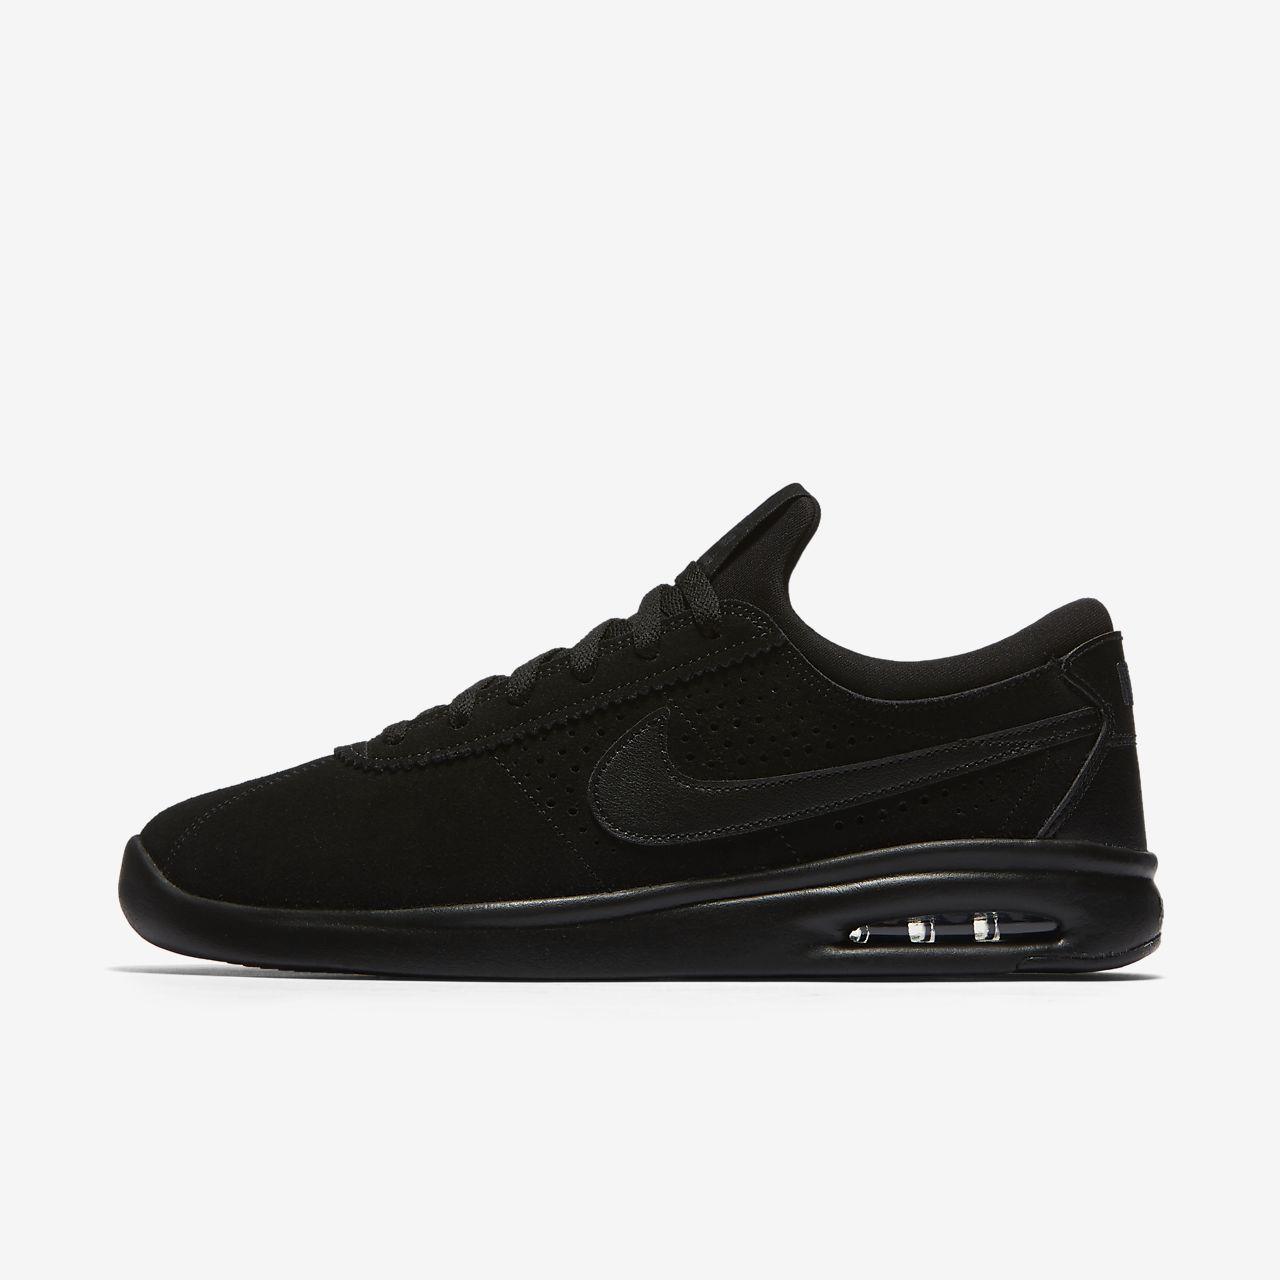 TG.36.5 Nike Vapor giacca da uomo